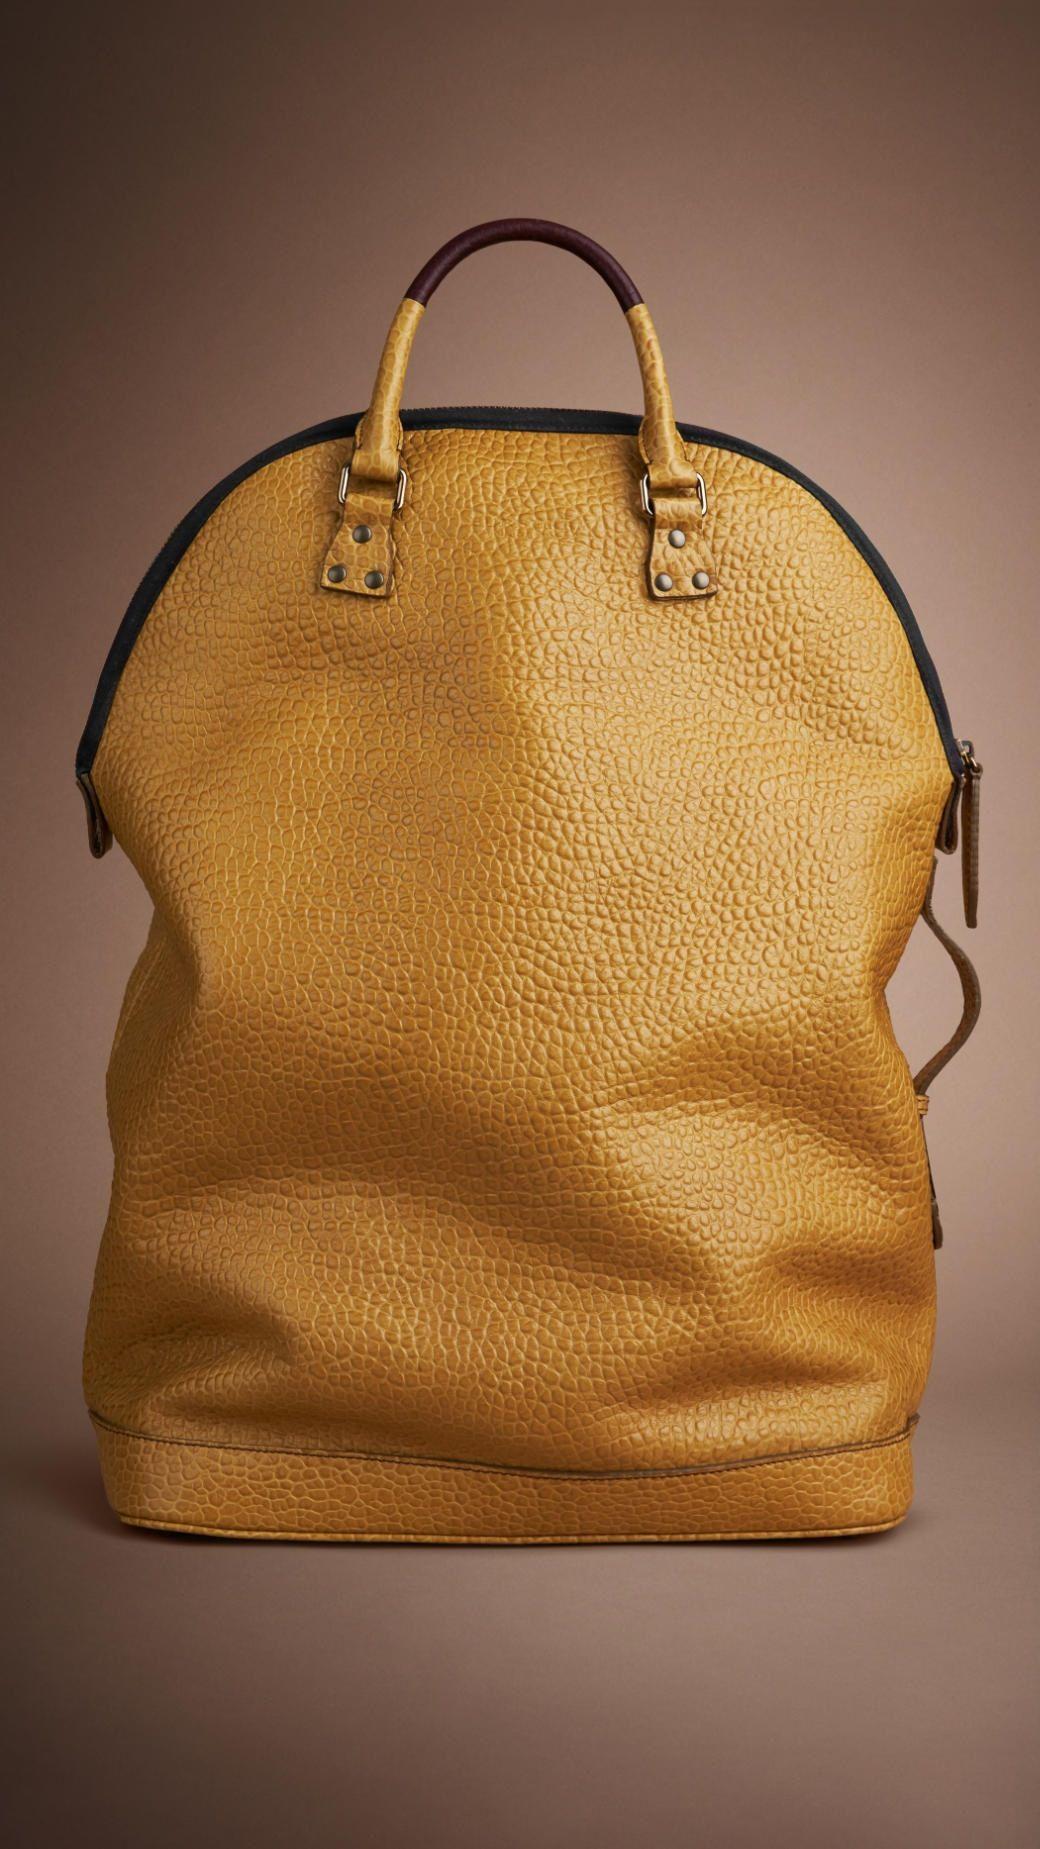 Burberry Scarf Handbags For Christmas Gift Outlet Sal